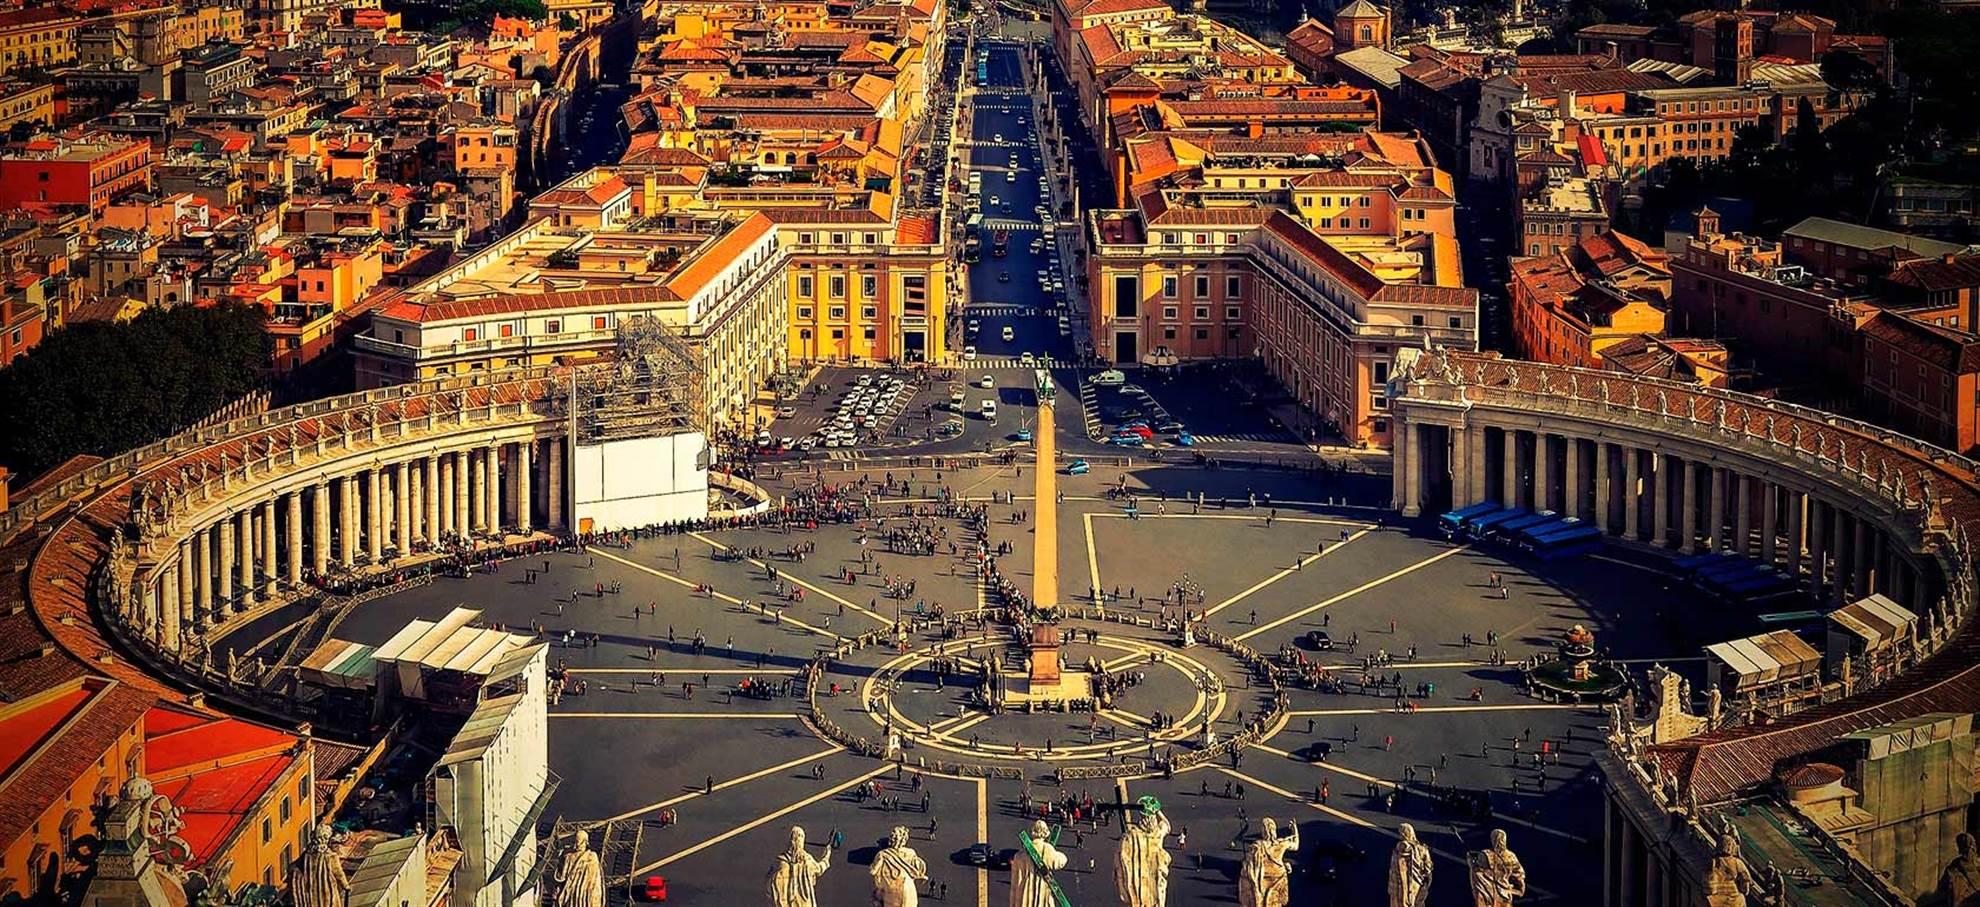 Музеи Ватикана и Сикстинская капелла